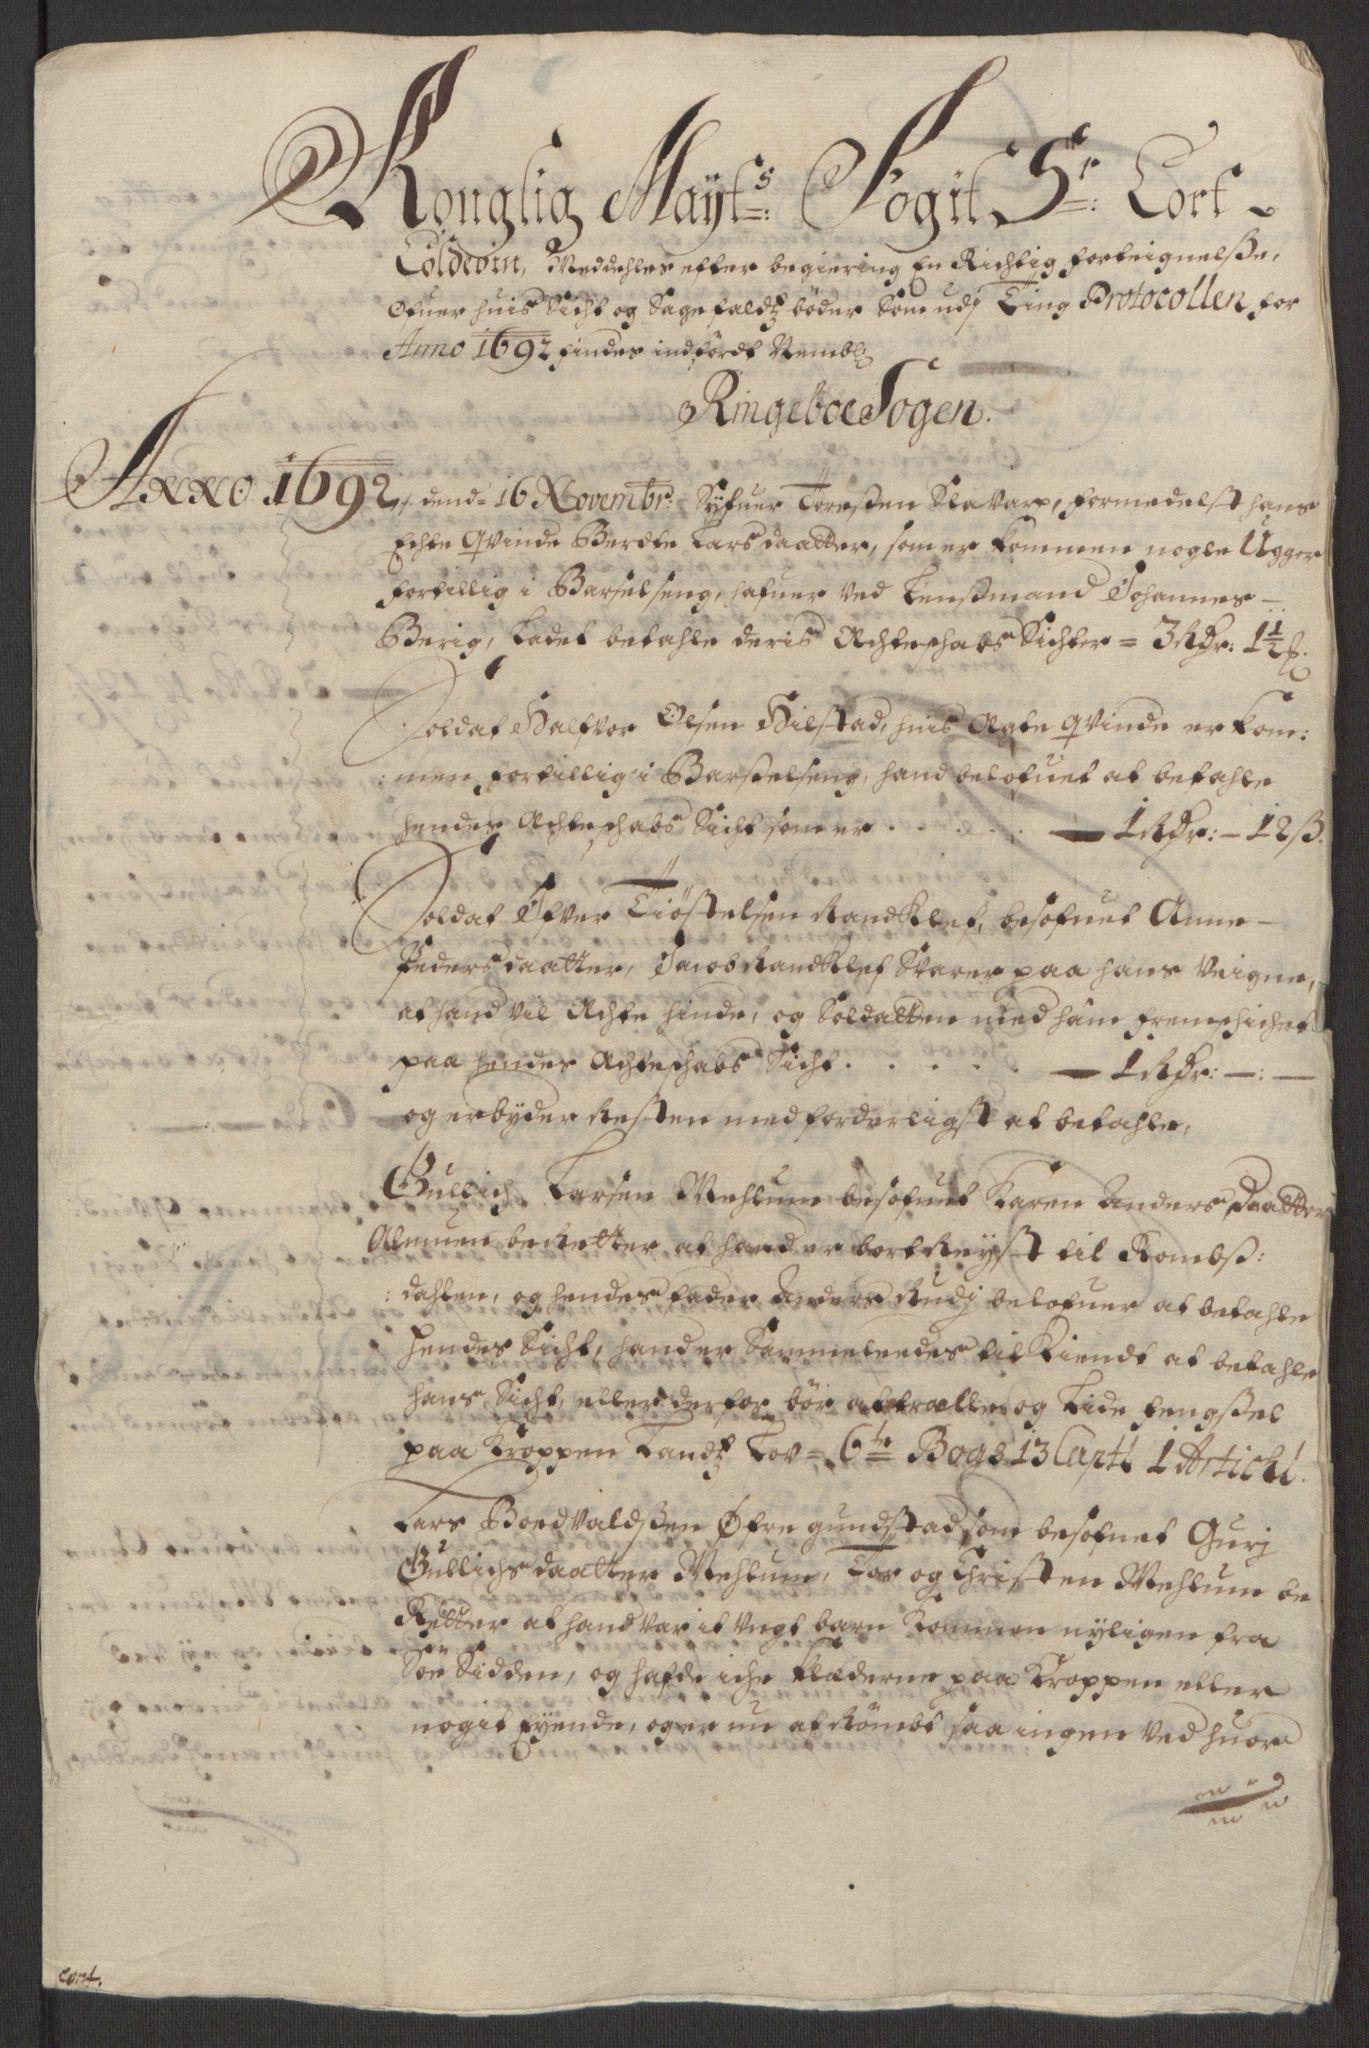 RA, Rentekammeret inntil 1814, Reviderte regnskaper, Fogderegnskap, R17/L1166: Fogderegnskap Gudbrandsdal, 1690-1692, s. 154